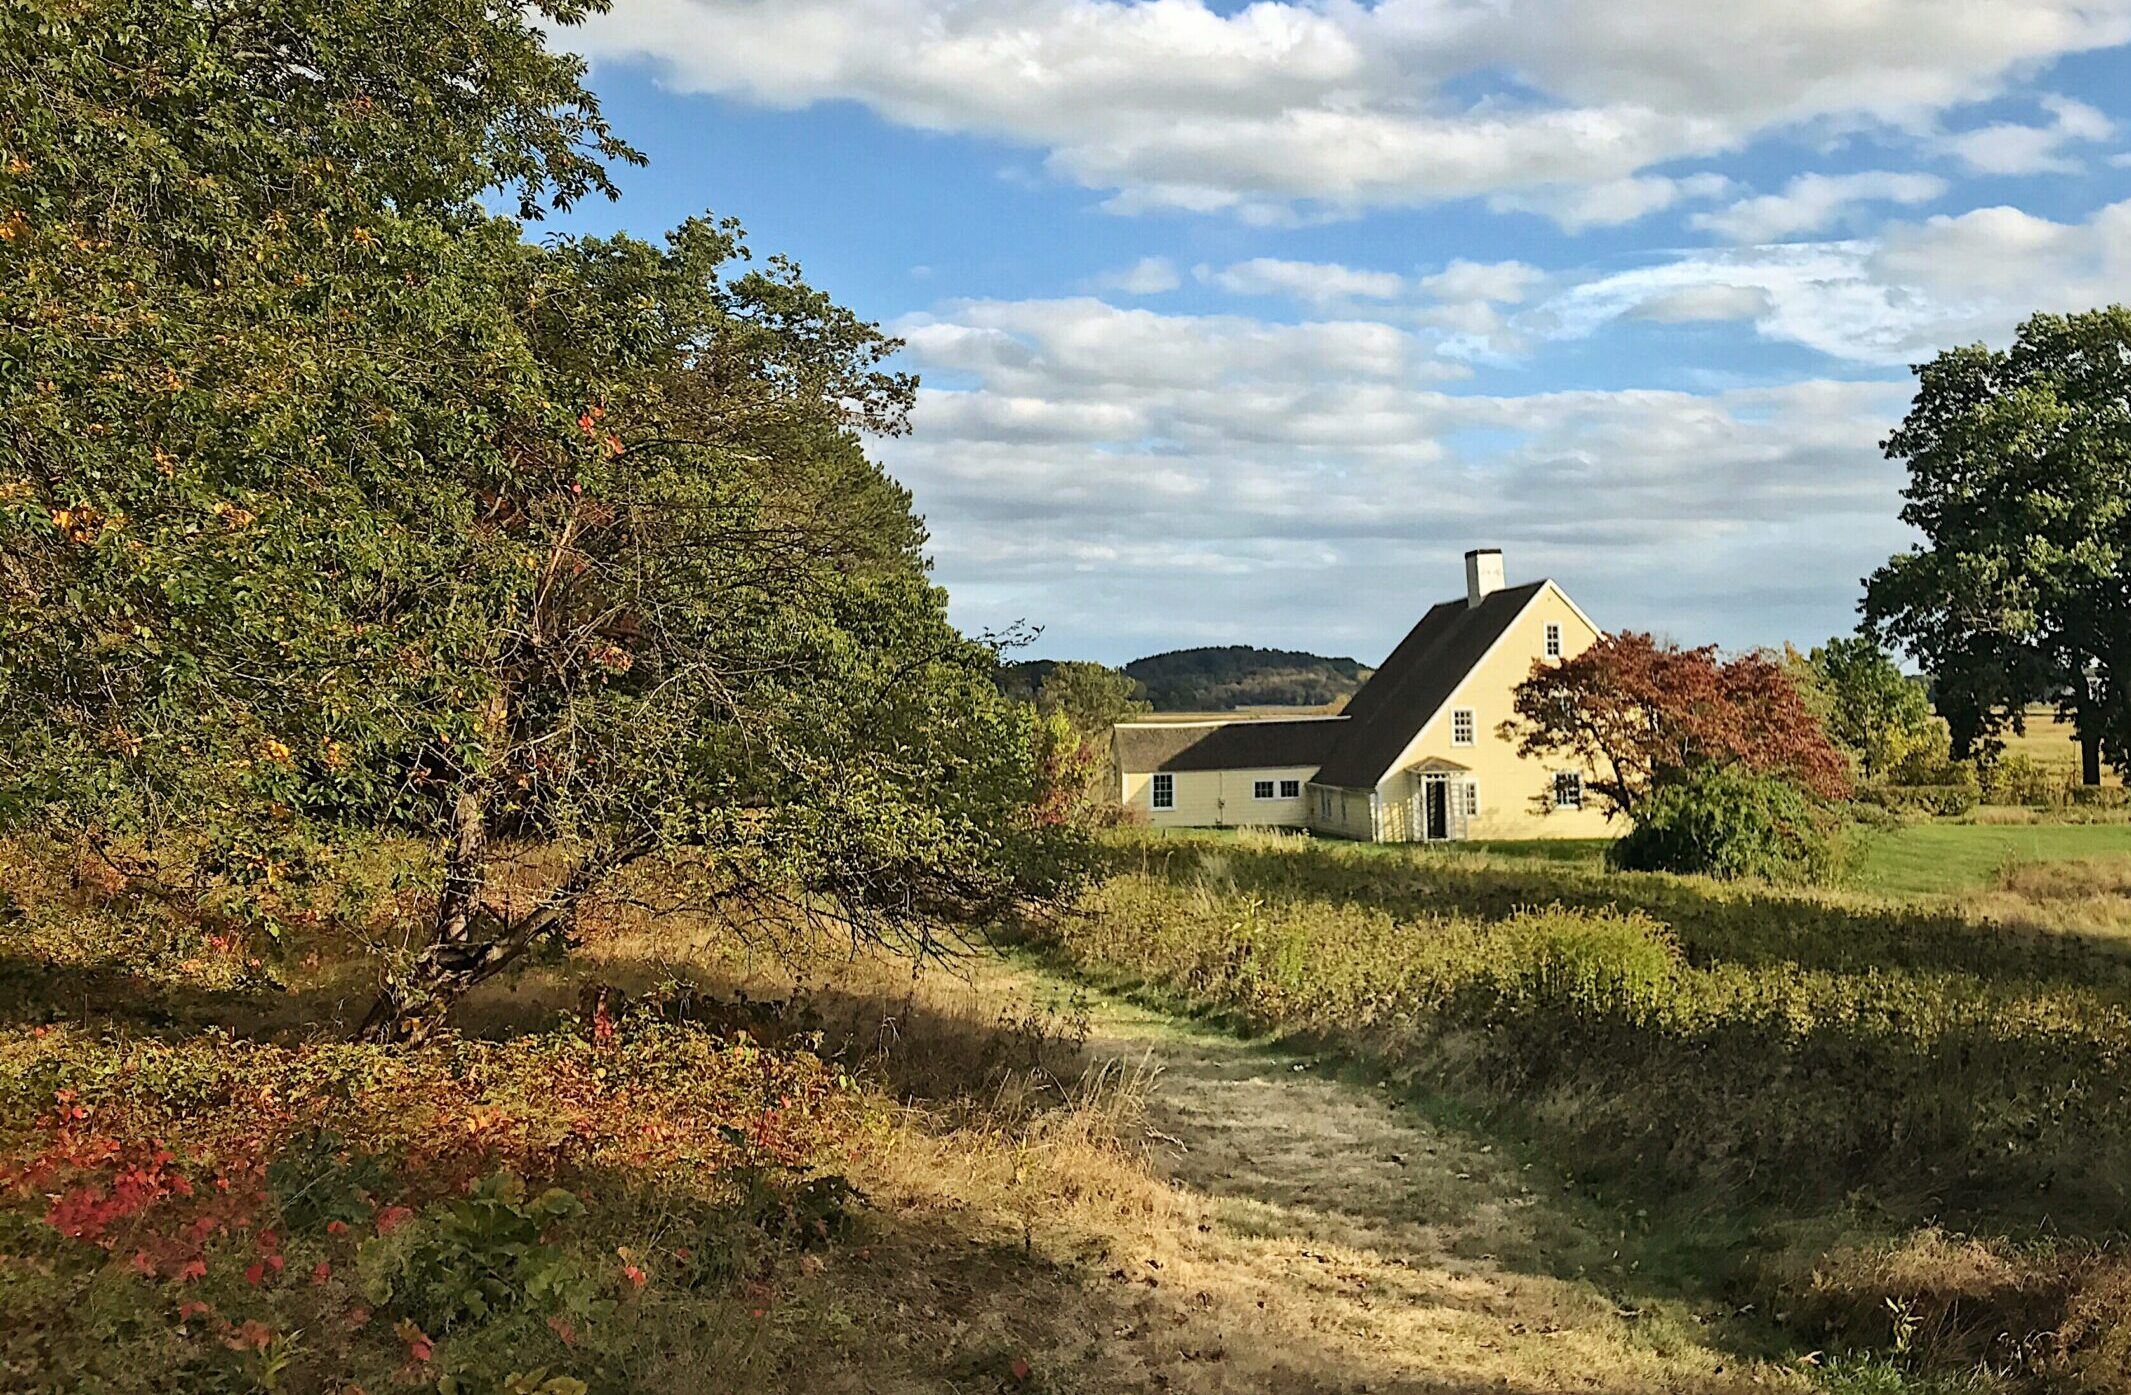 Greenwood Farm, Paine House